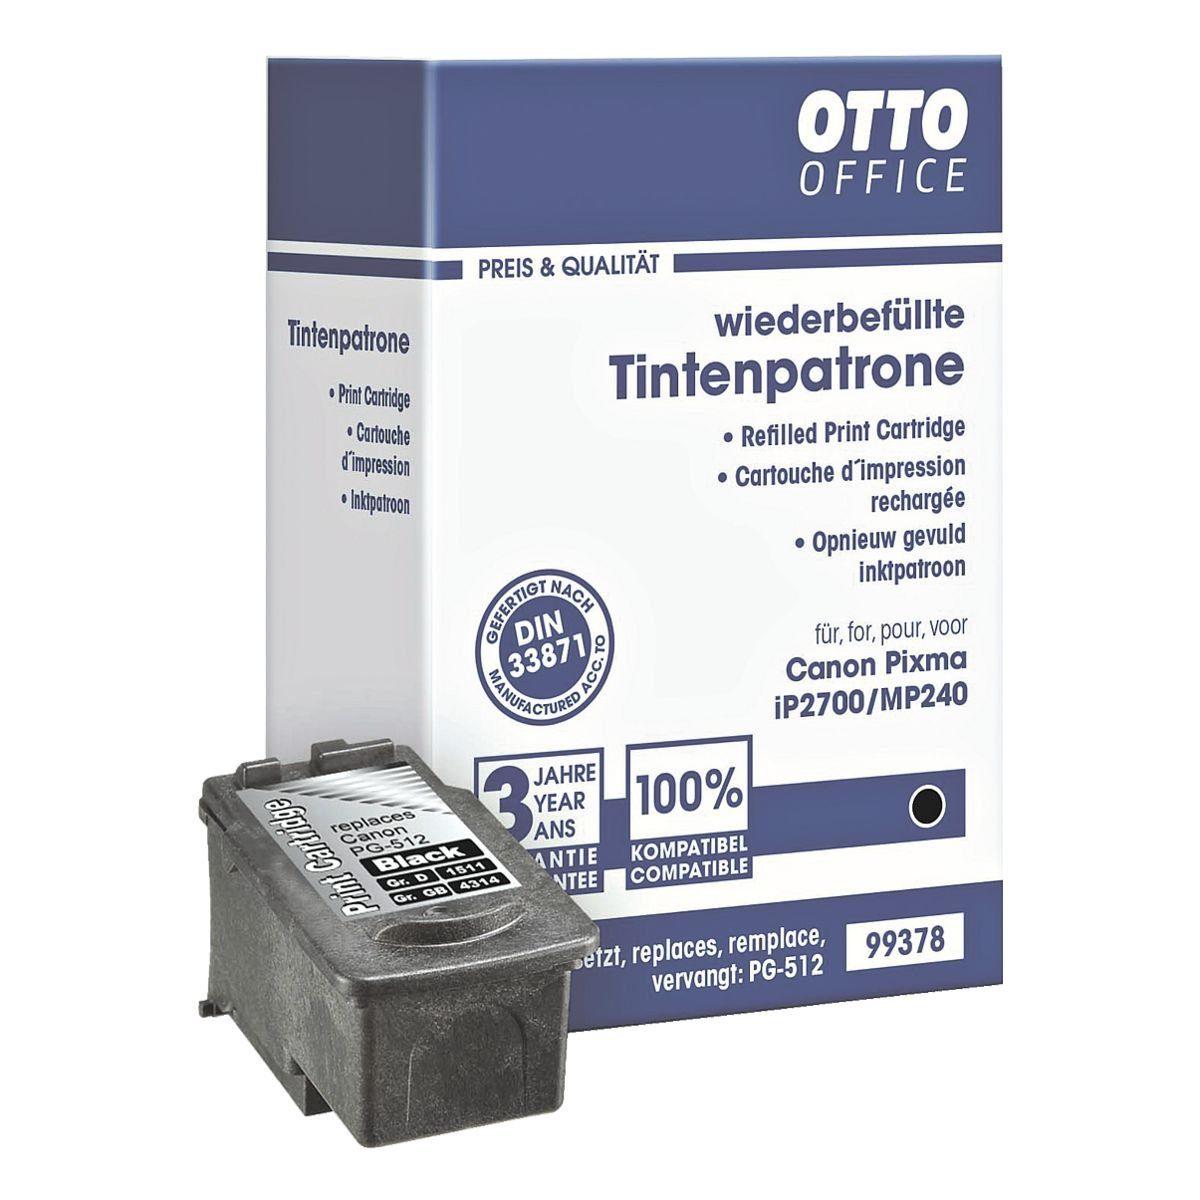 OTTO Office Tintenpatrone ersetzt Canon »PG-512«